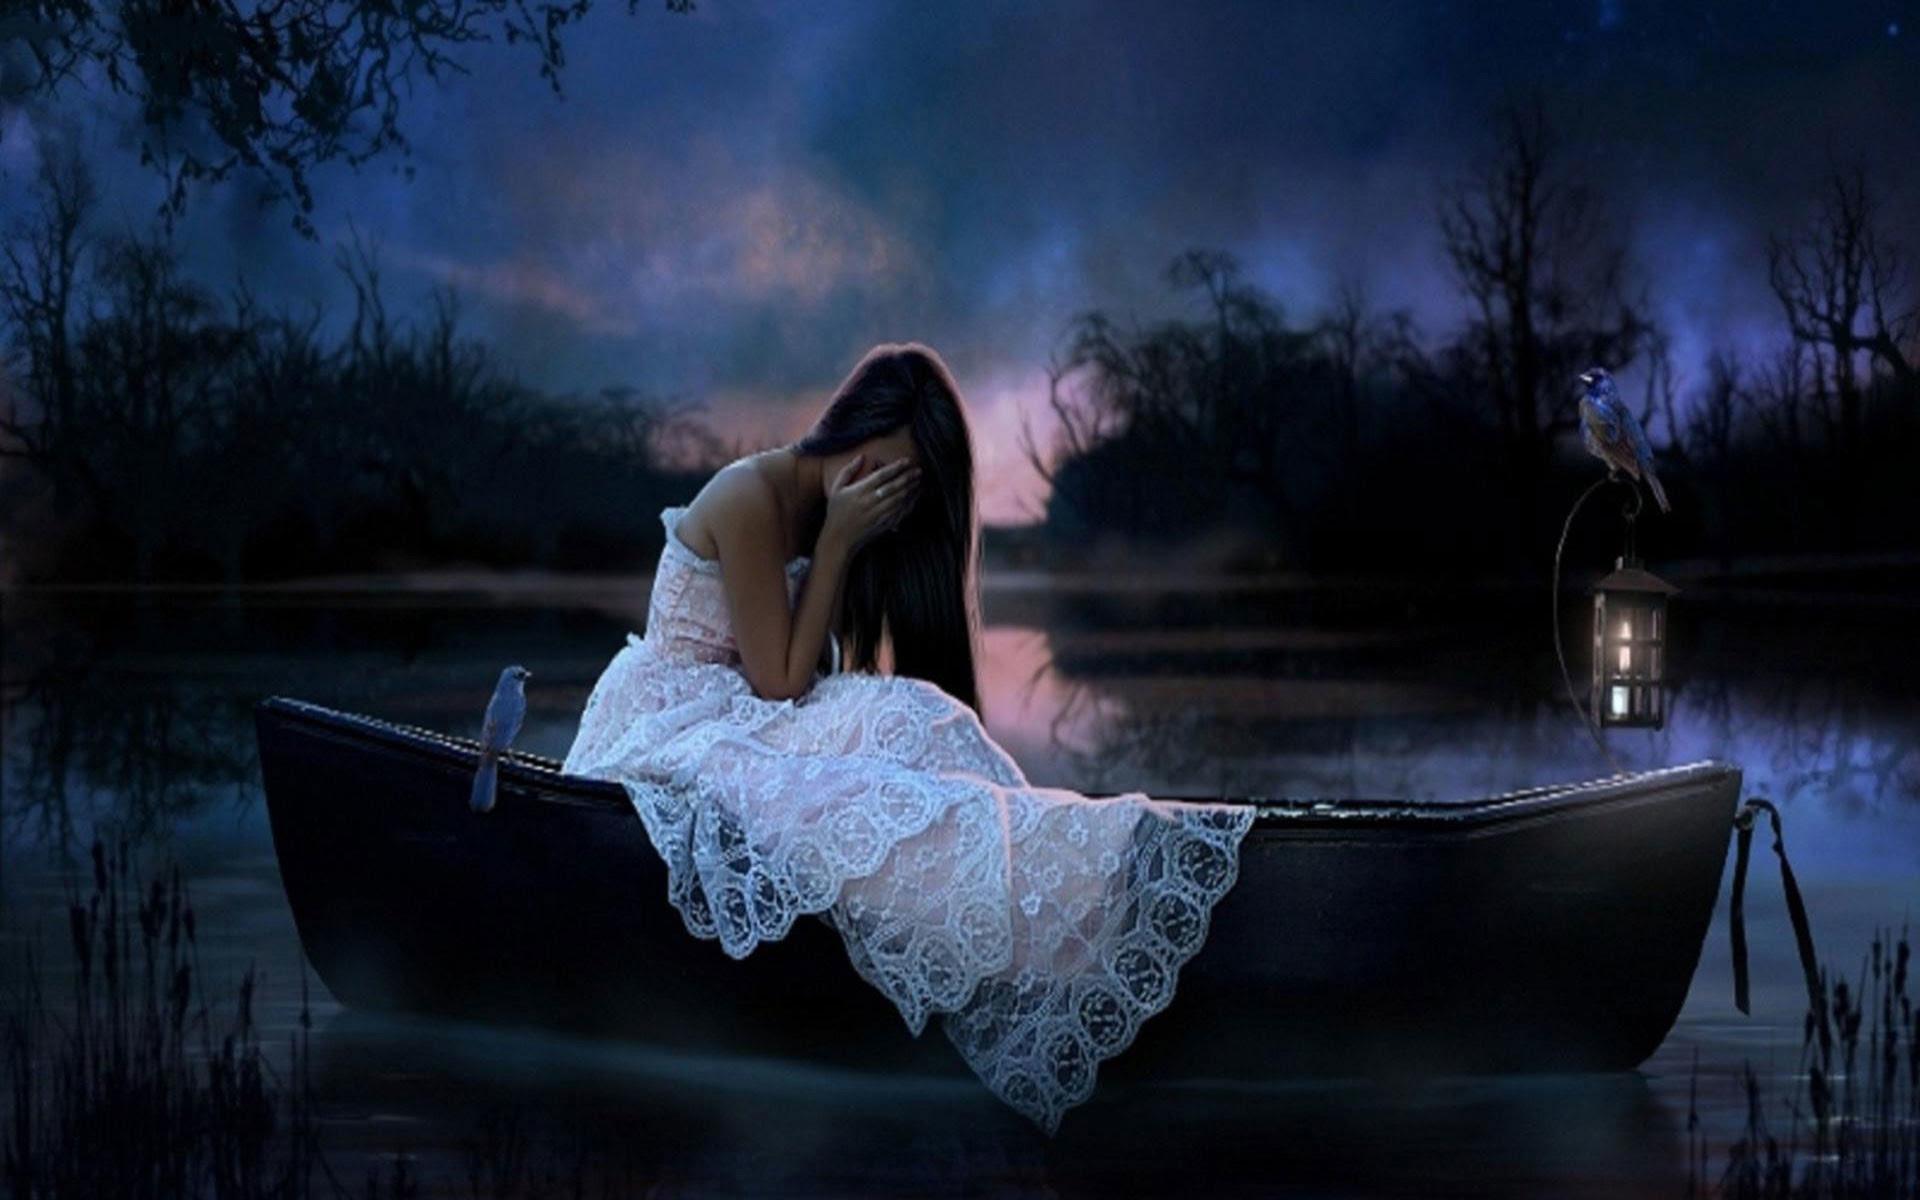 Sad Alone Wallpaper Hd 63 Images